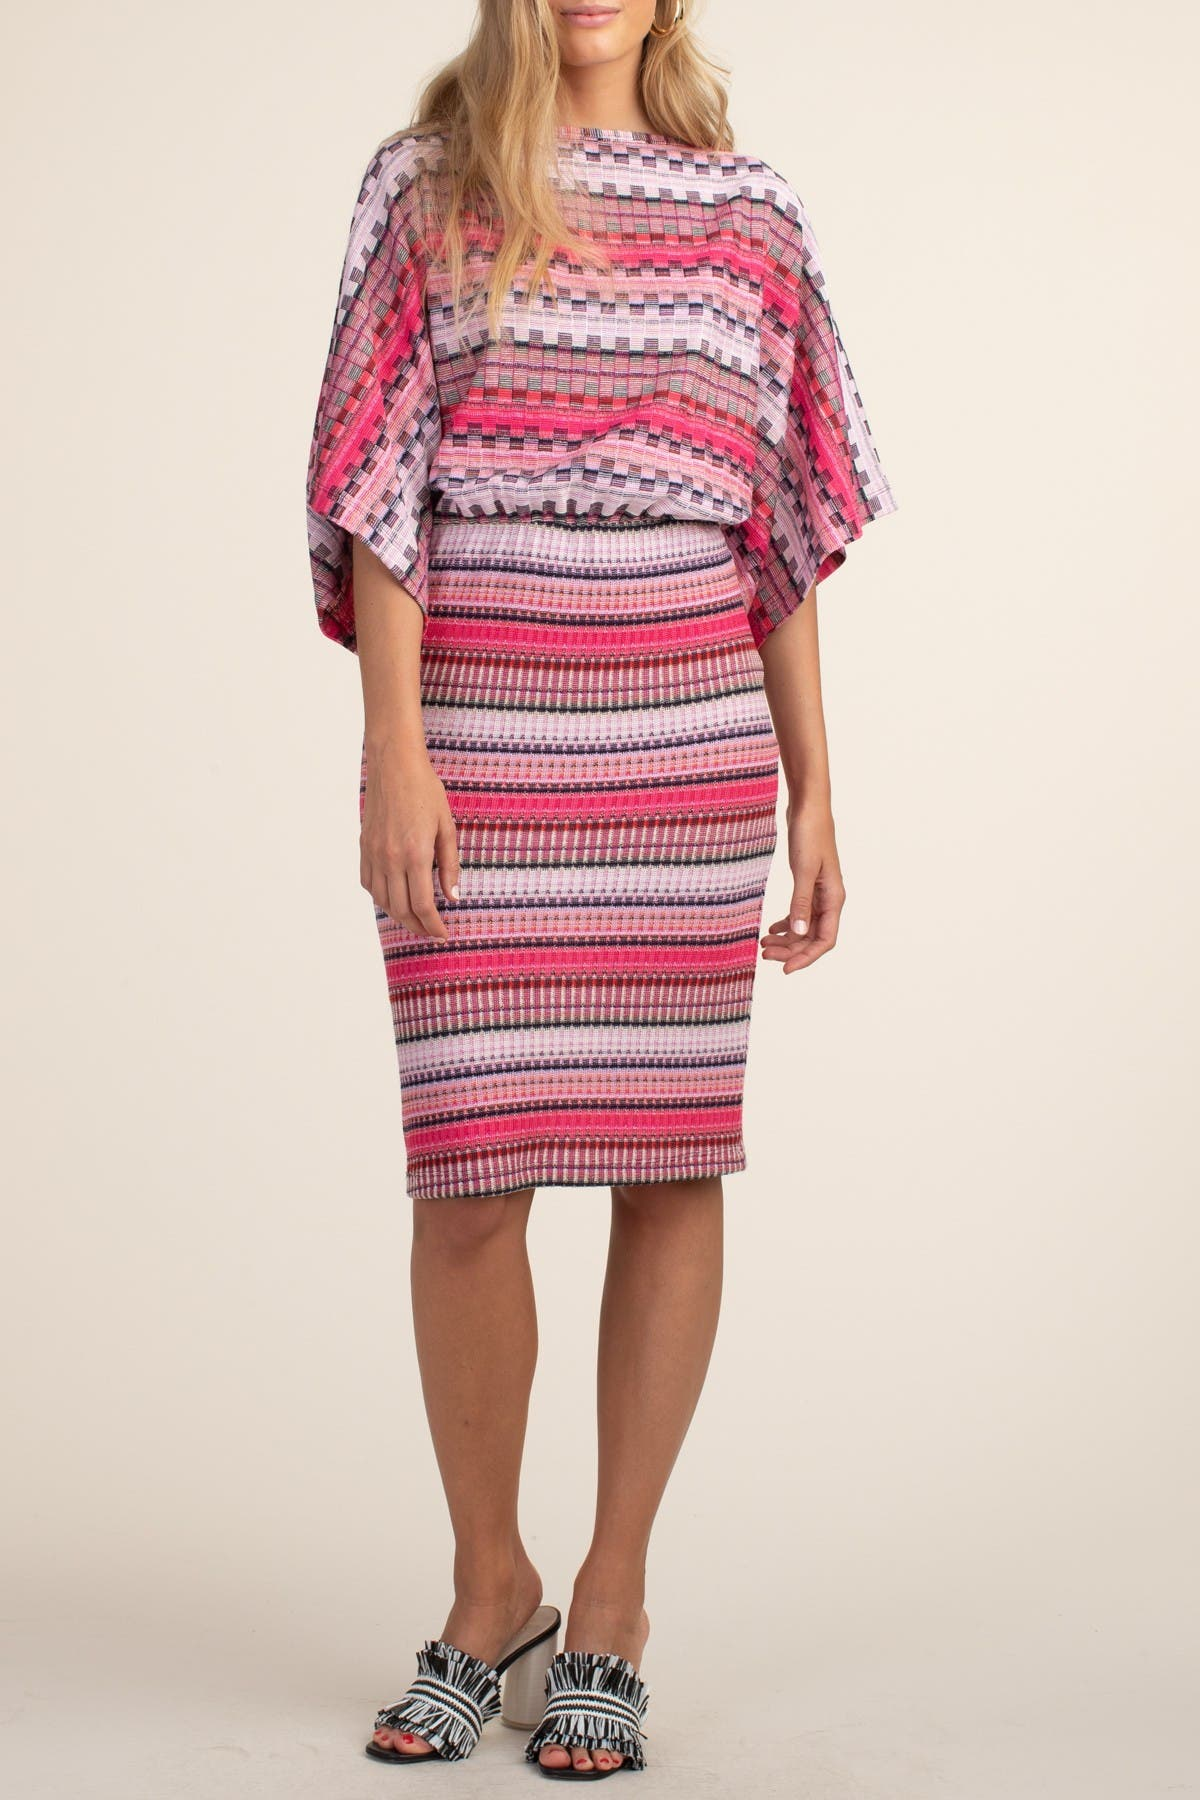 Image of Trina Turk Toriah Dress